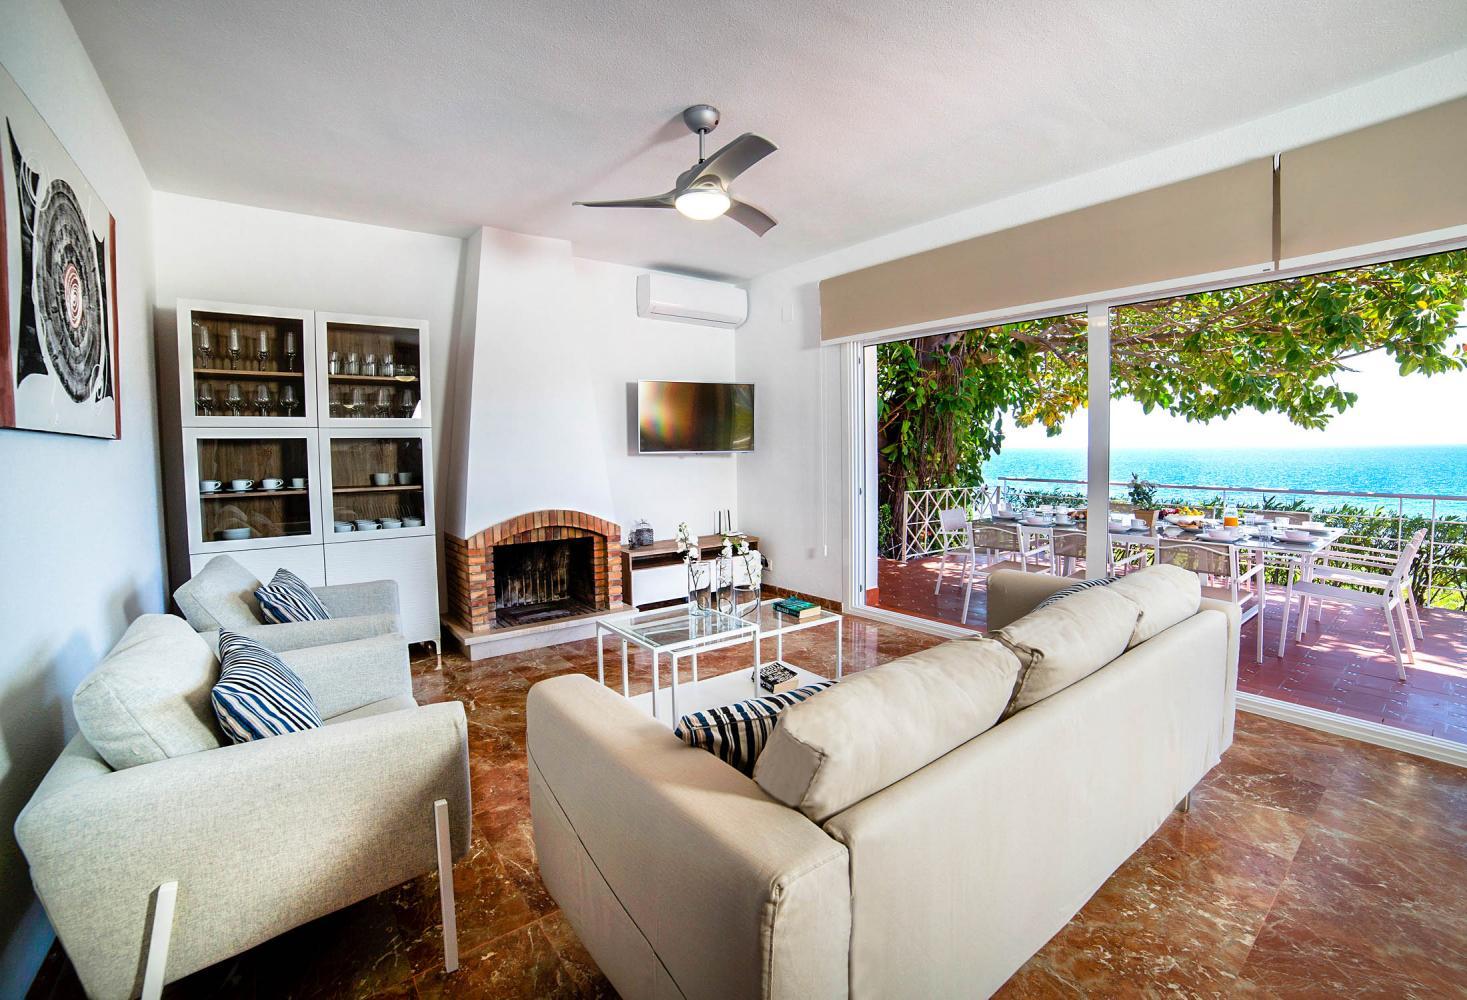 Villa Perla in Calpe - sleeps 10 people